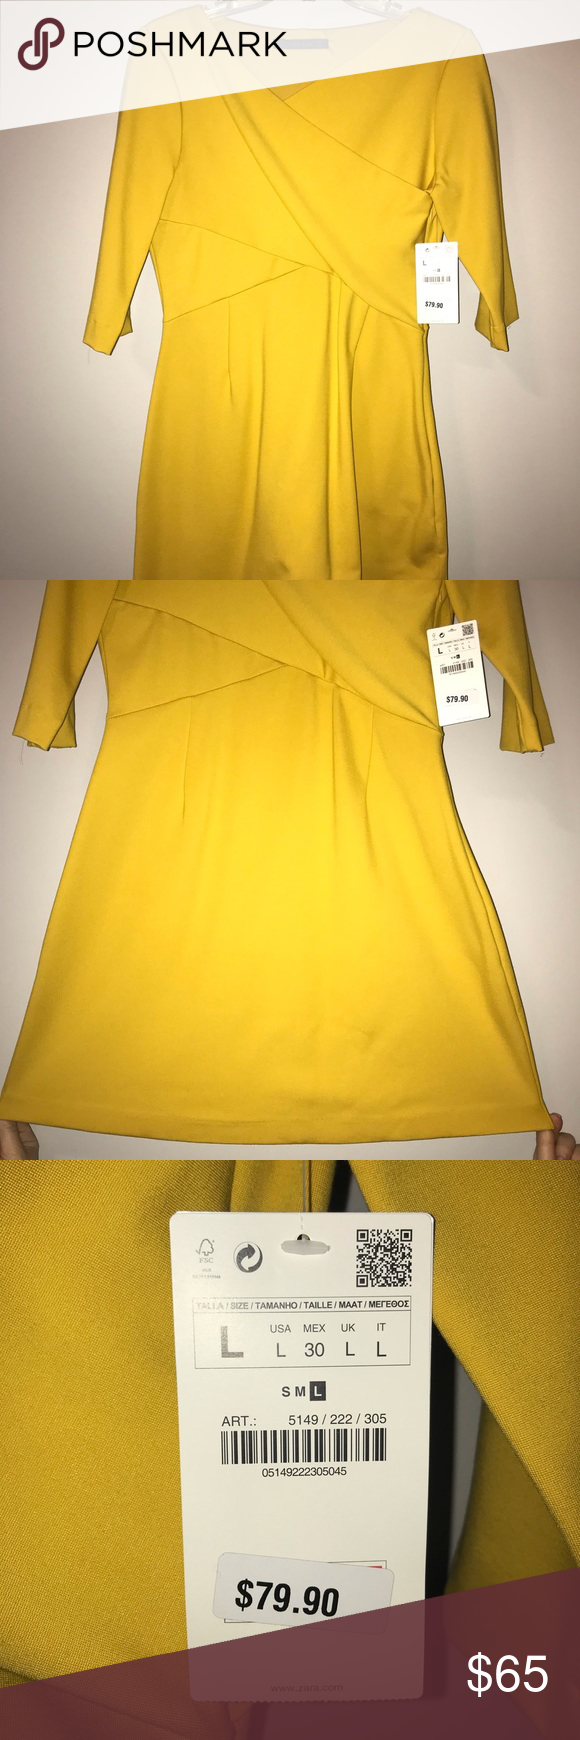 aa8e9372 ZARA Short Dress NWT Short, yellow dress with mid quarter sleeves from Zara.  Brand new with tags. Soft material. Zara Dresses Mini